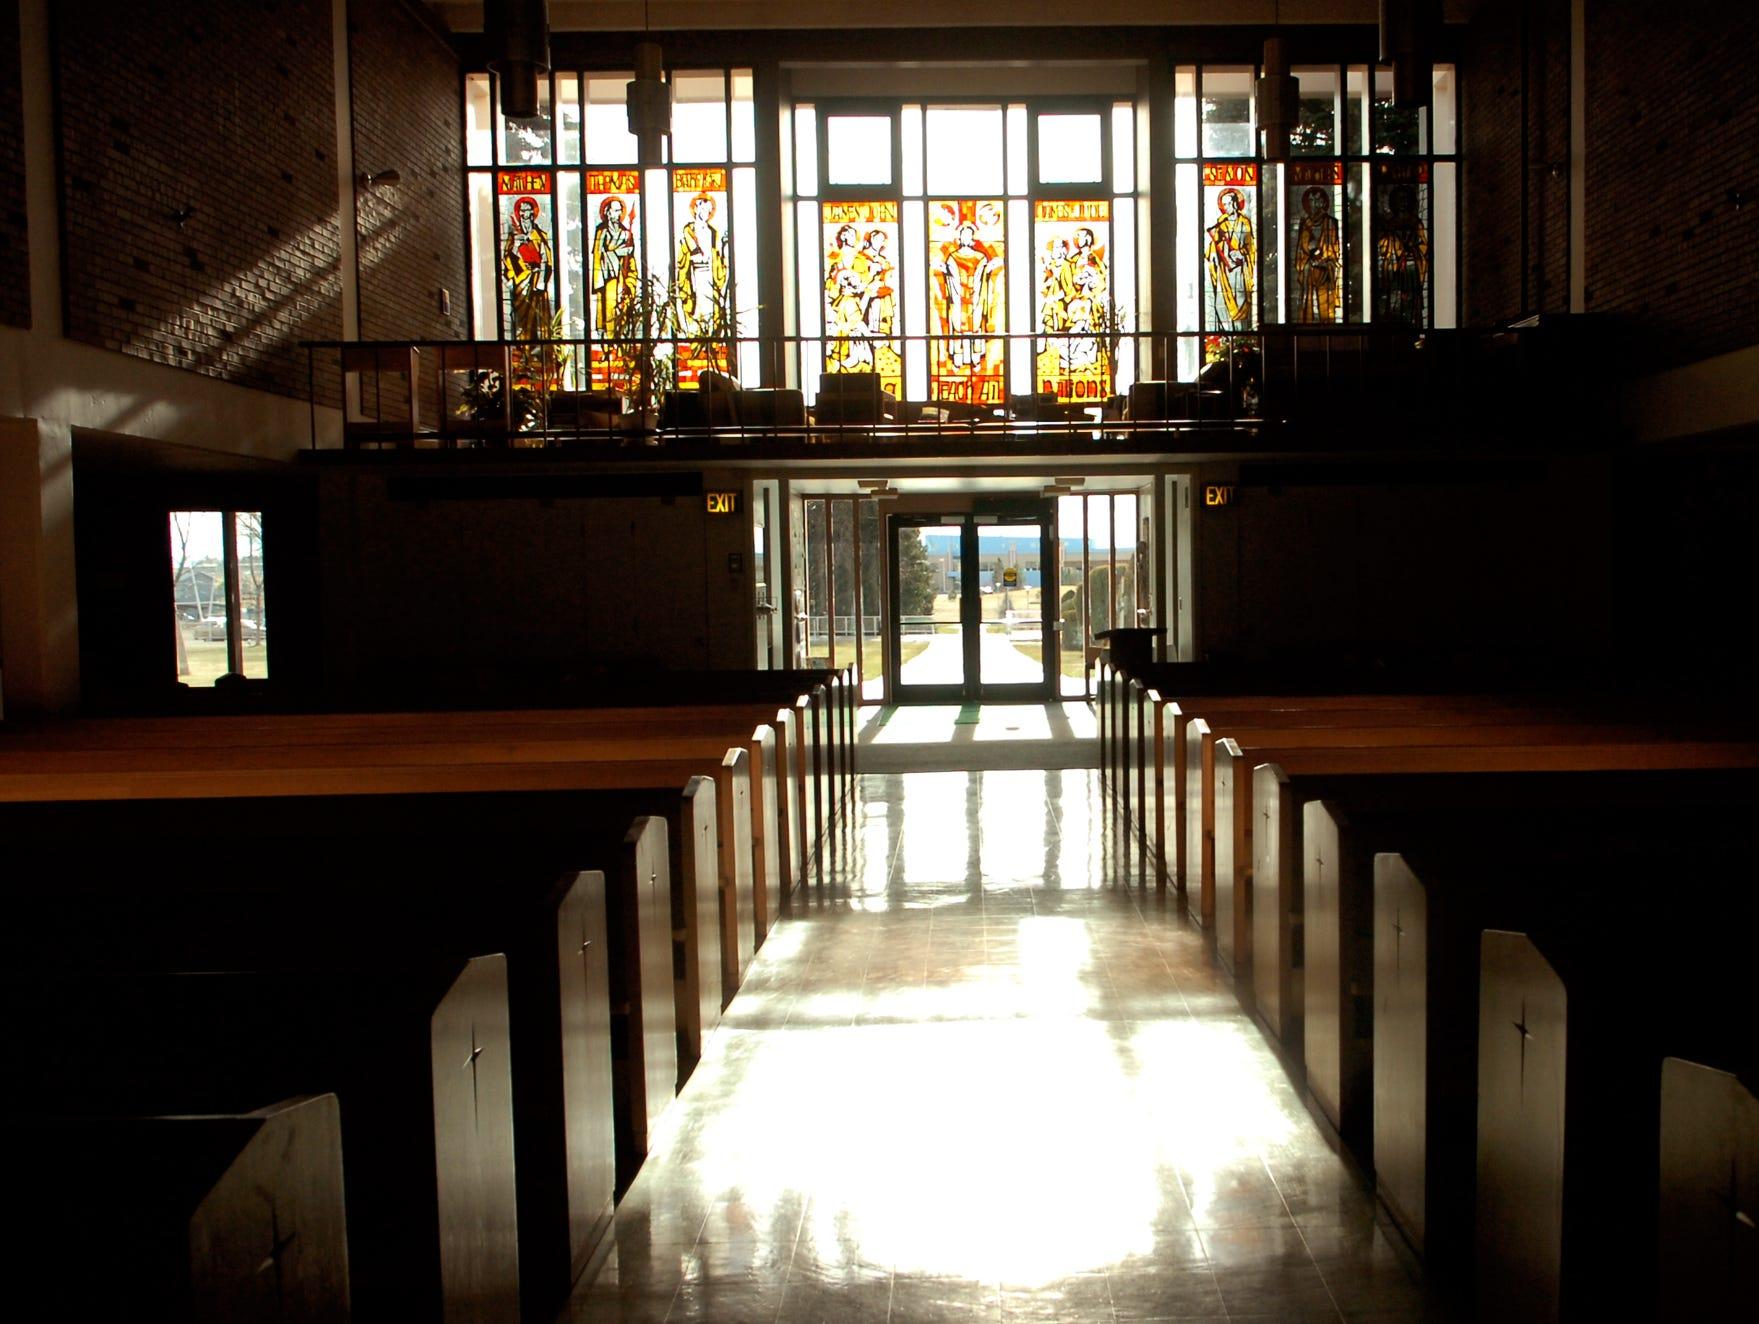 The University of Providence chapel